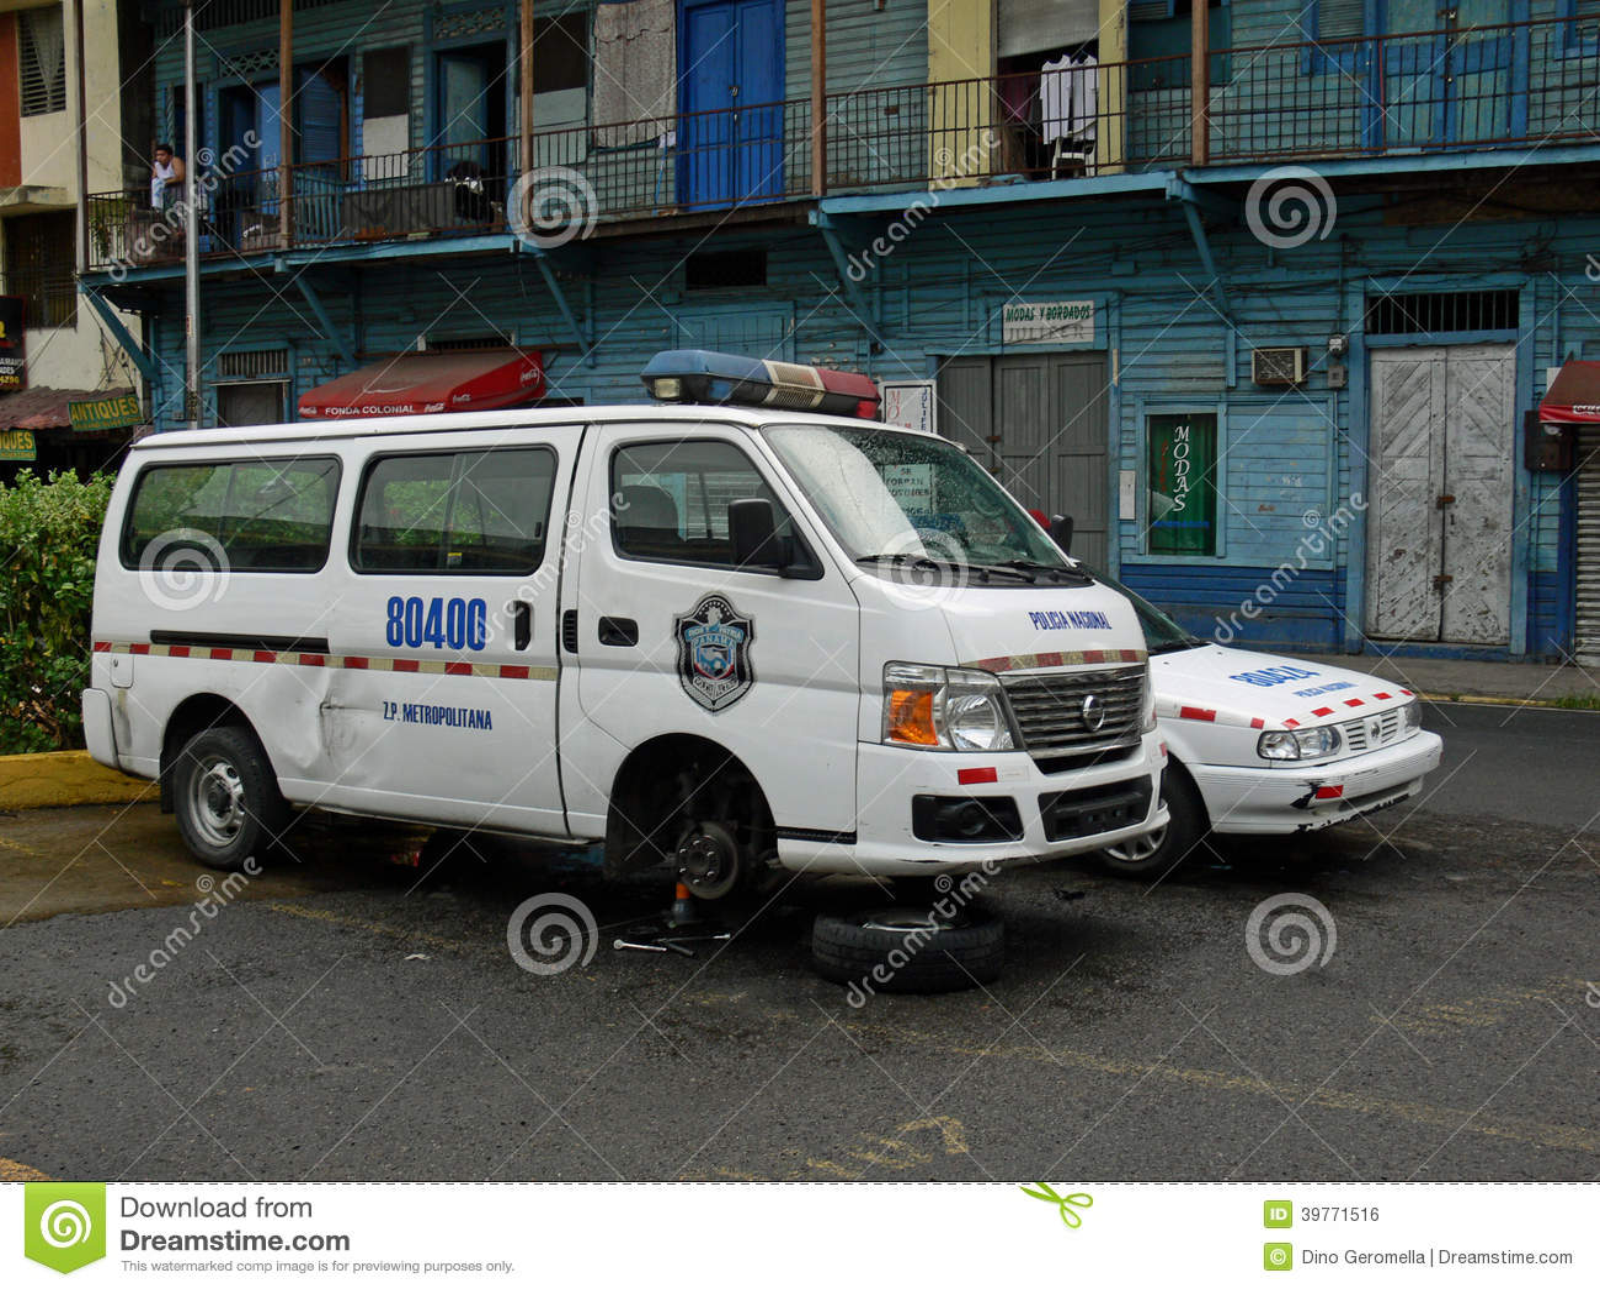 Car Audio Panama City